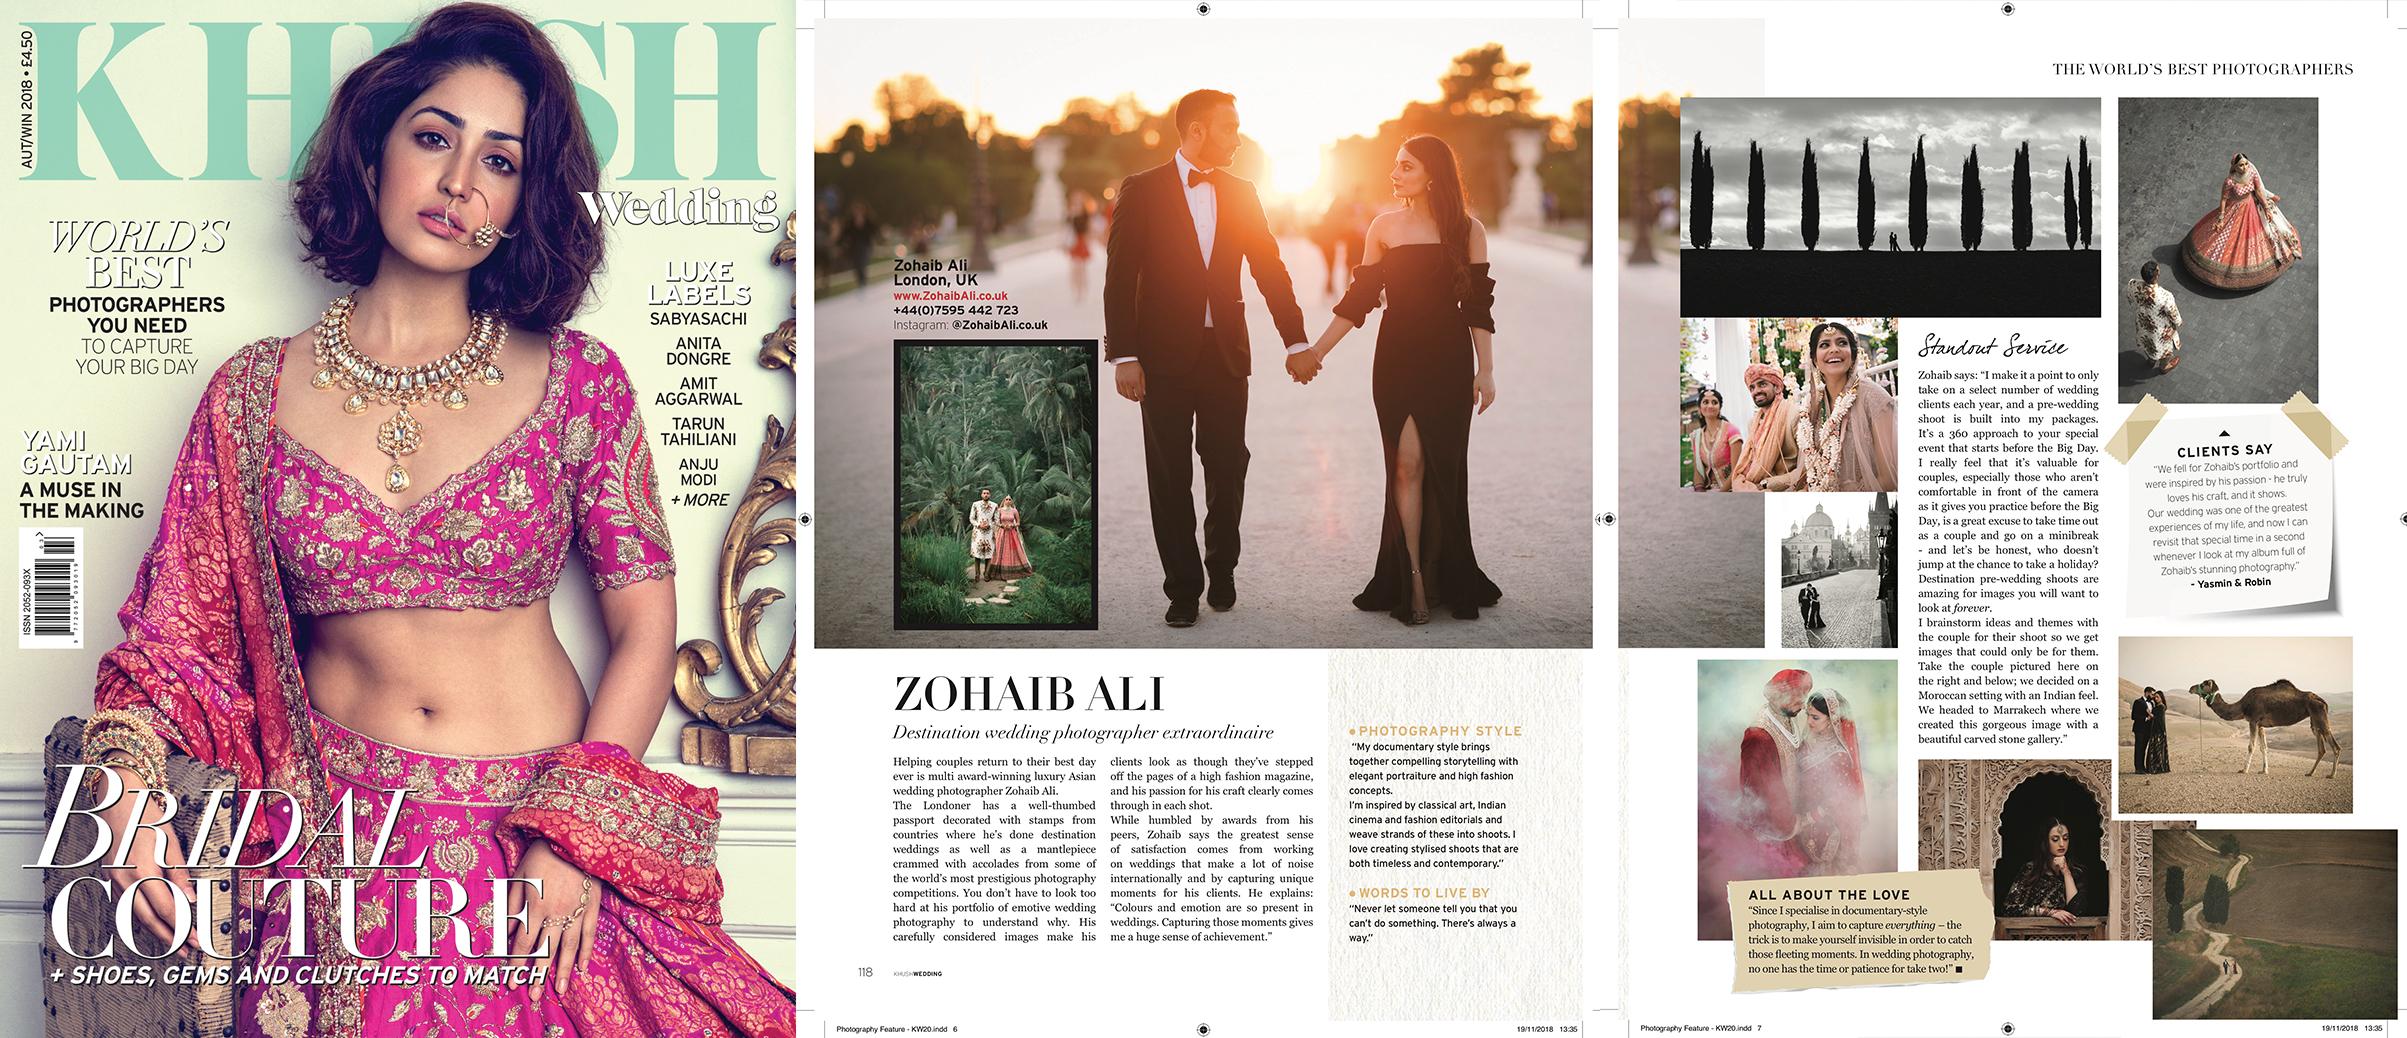 Zohaib Ali Worlds Best Wedding Photographer